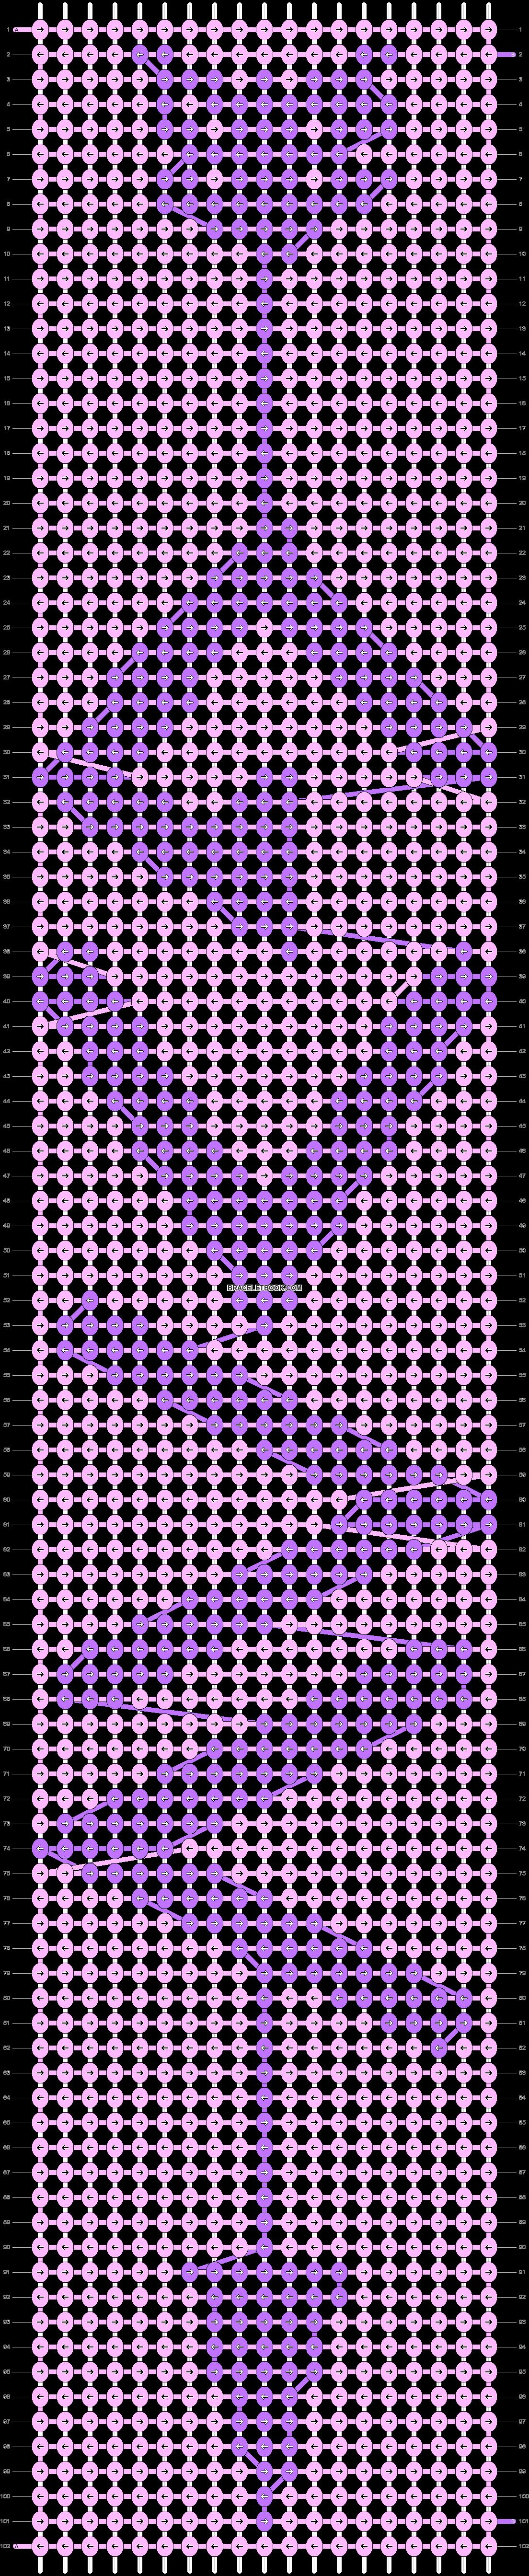 Alpha pattern #103502 pattern